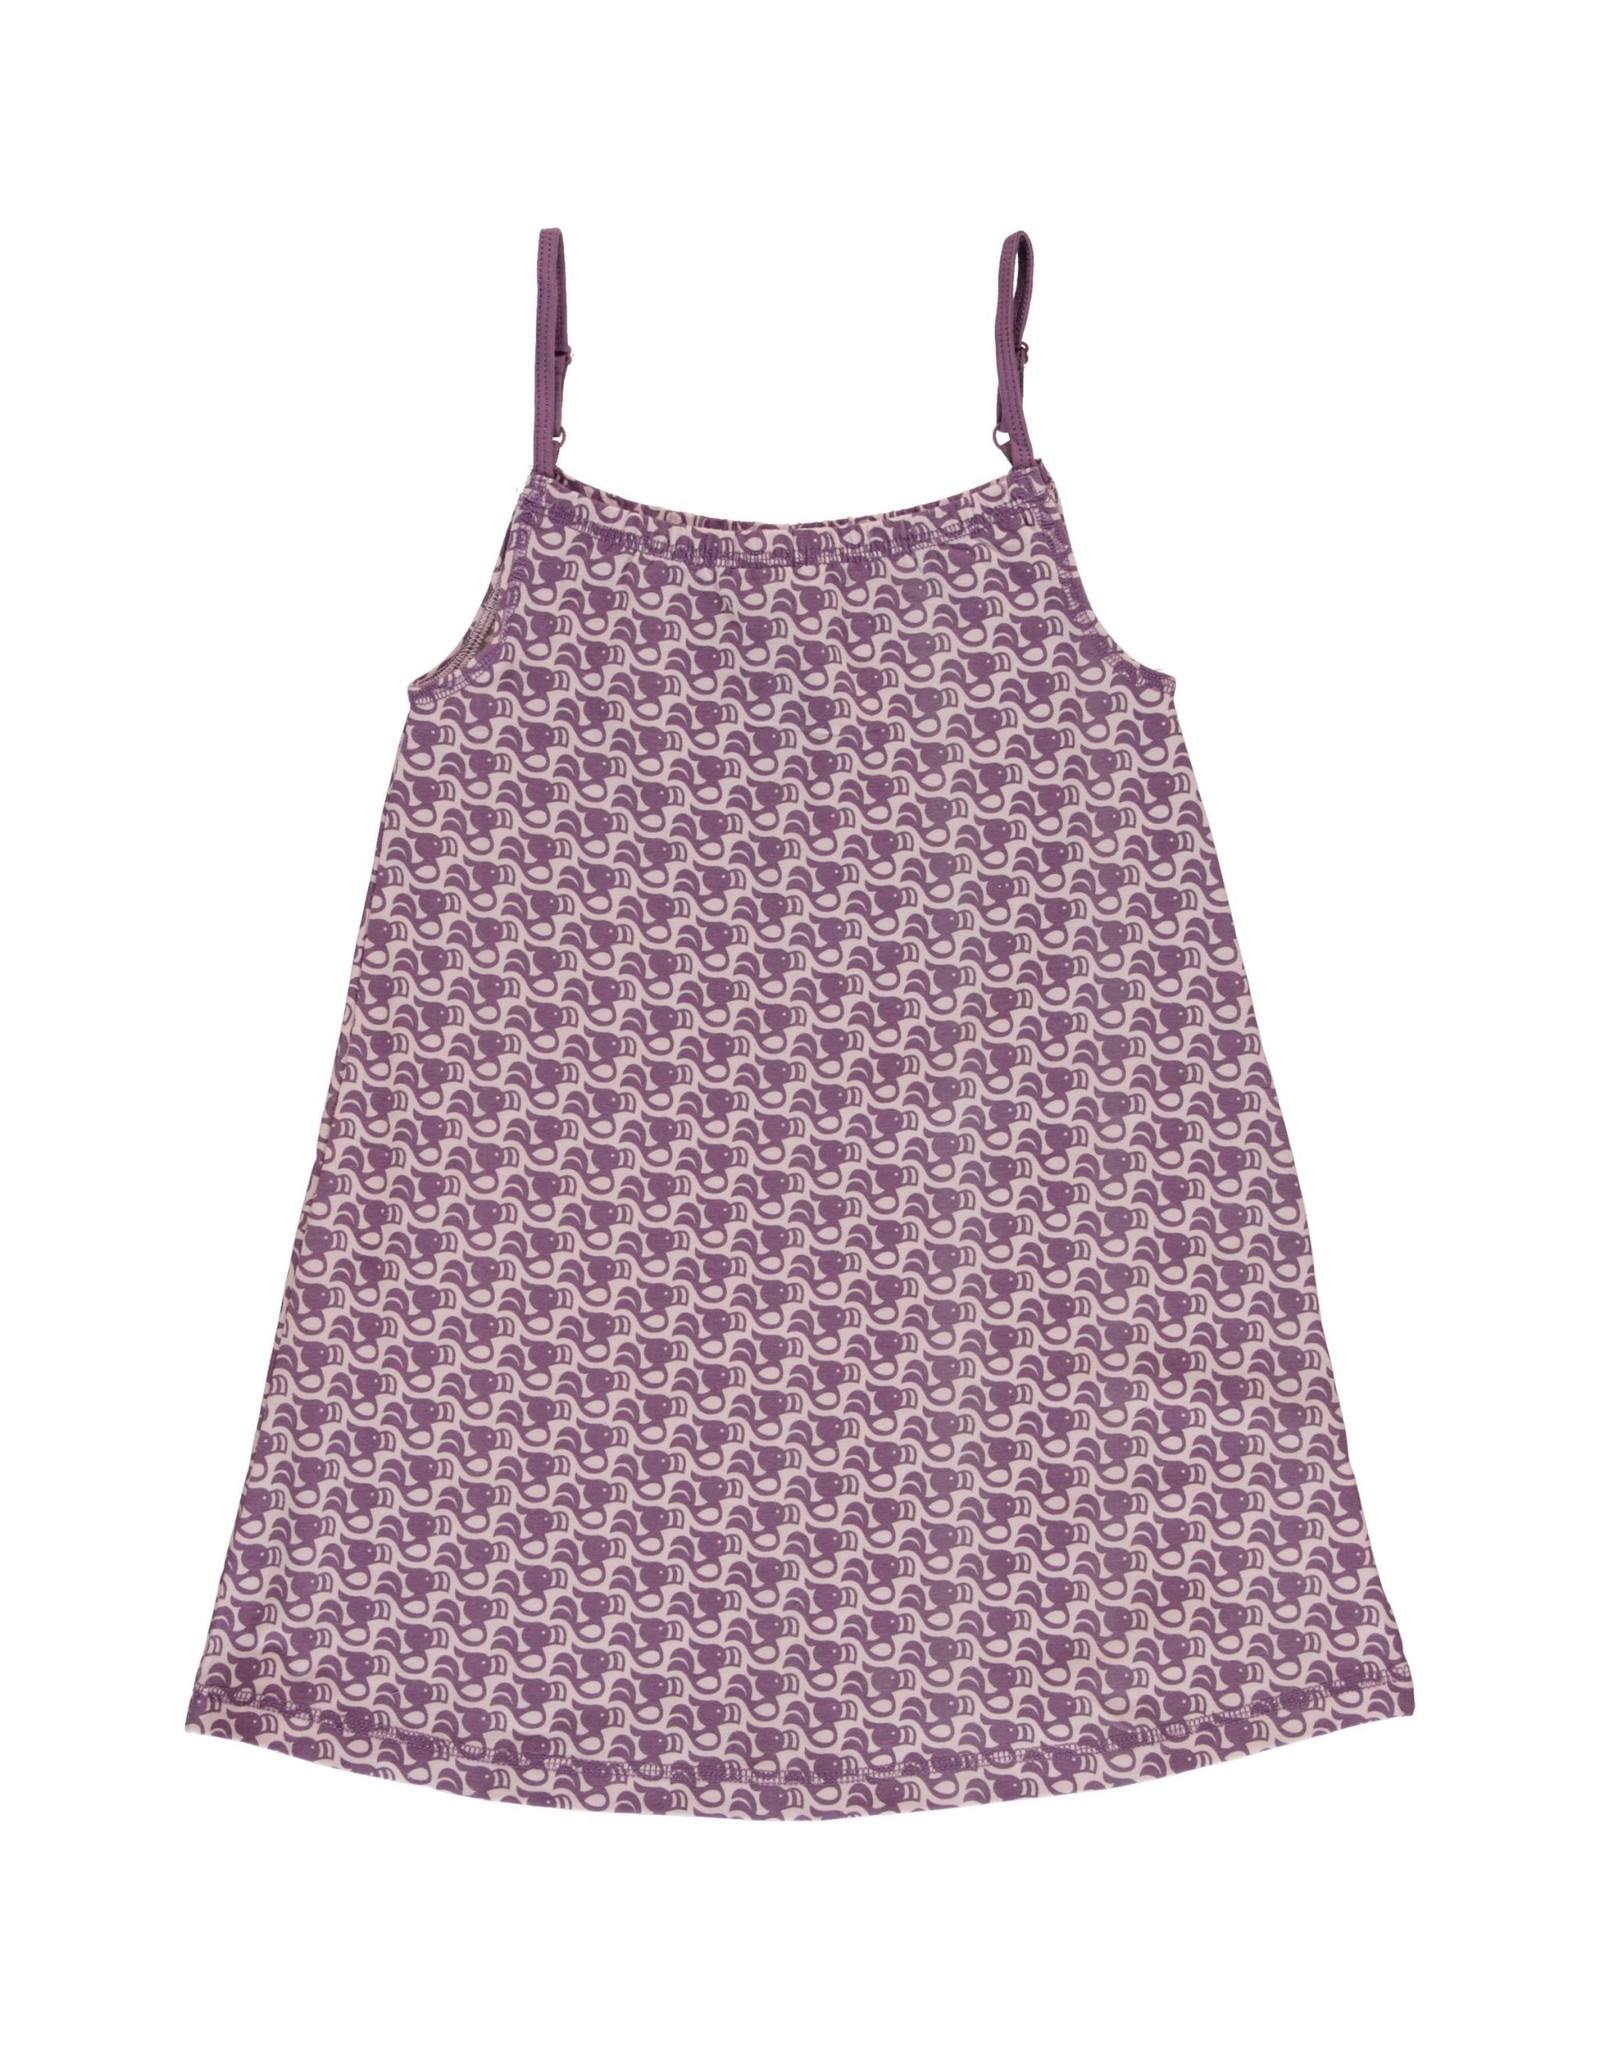 Maxomorra Spaghetti kleedje Met Toekan Print (MAAT 86/92)